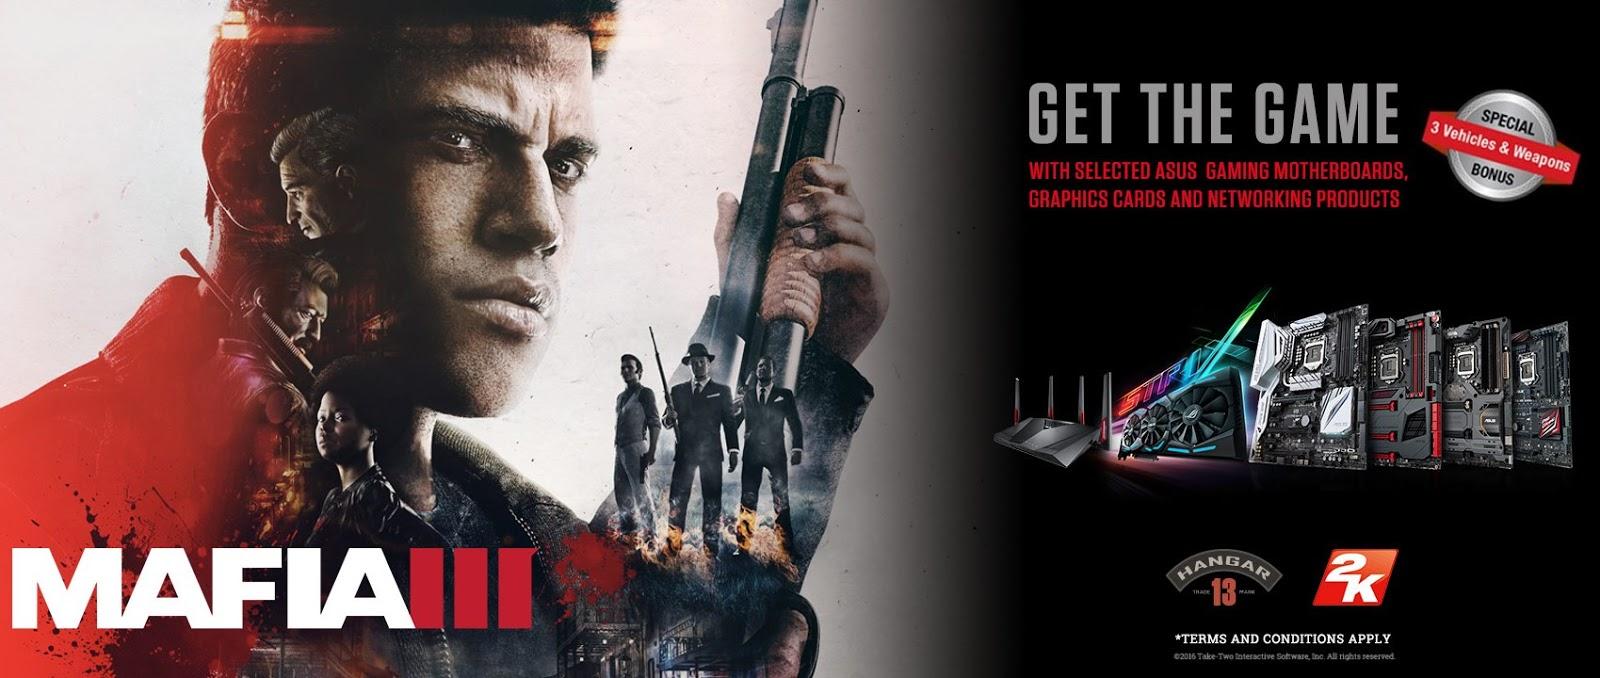 ASUS Republic of Gamers Announces Mafia III Game Bundles